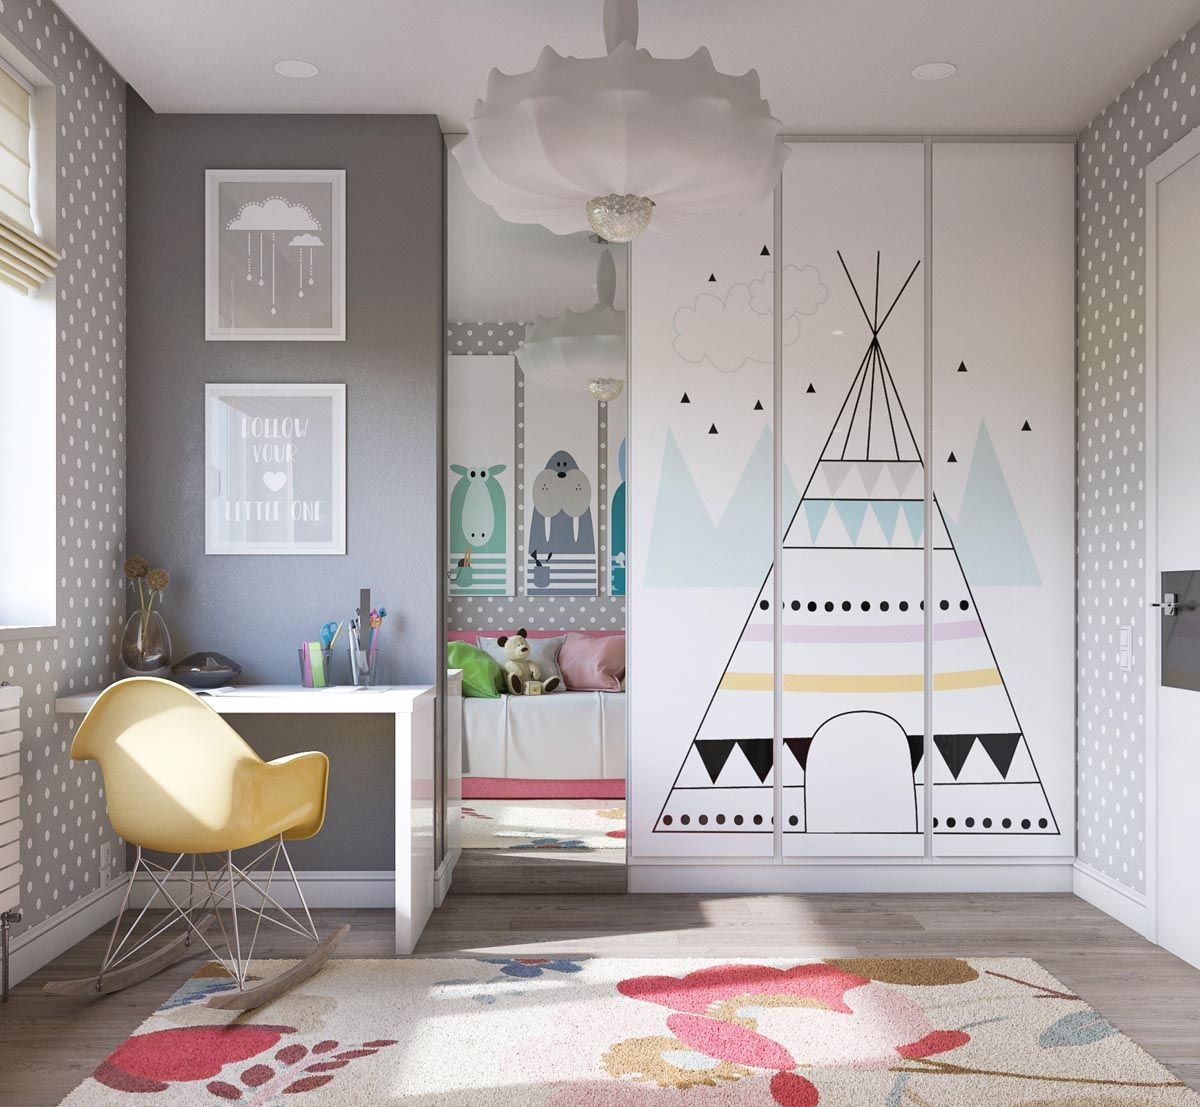 genc kiz odasi modelleri dekorasyon pinterest room kids rooms